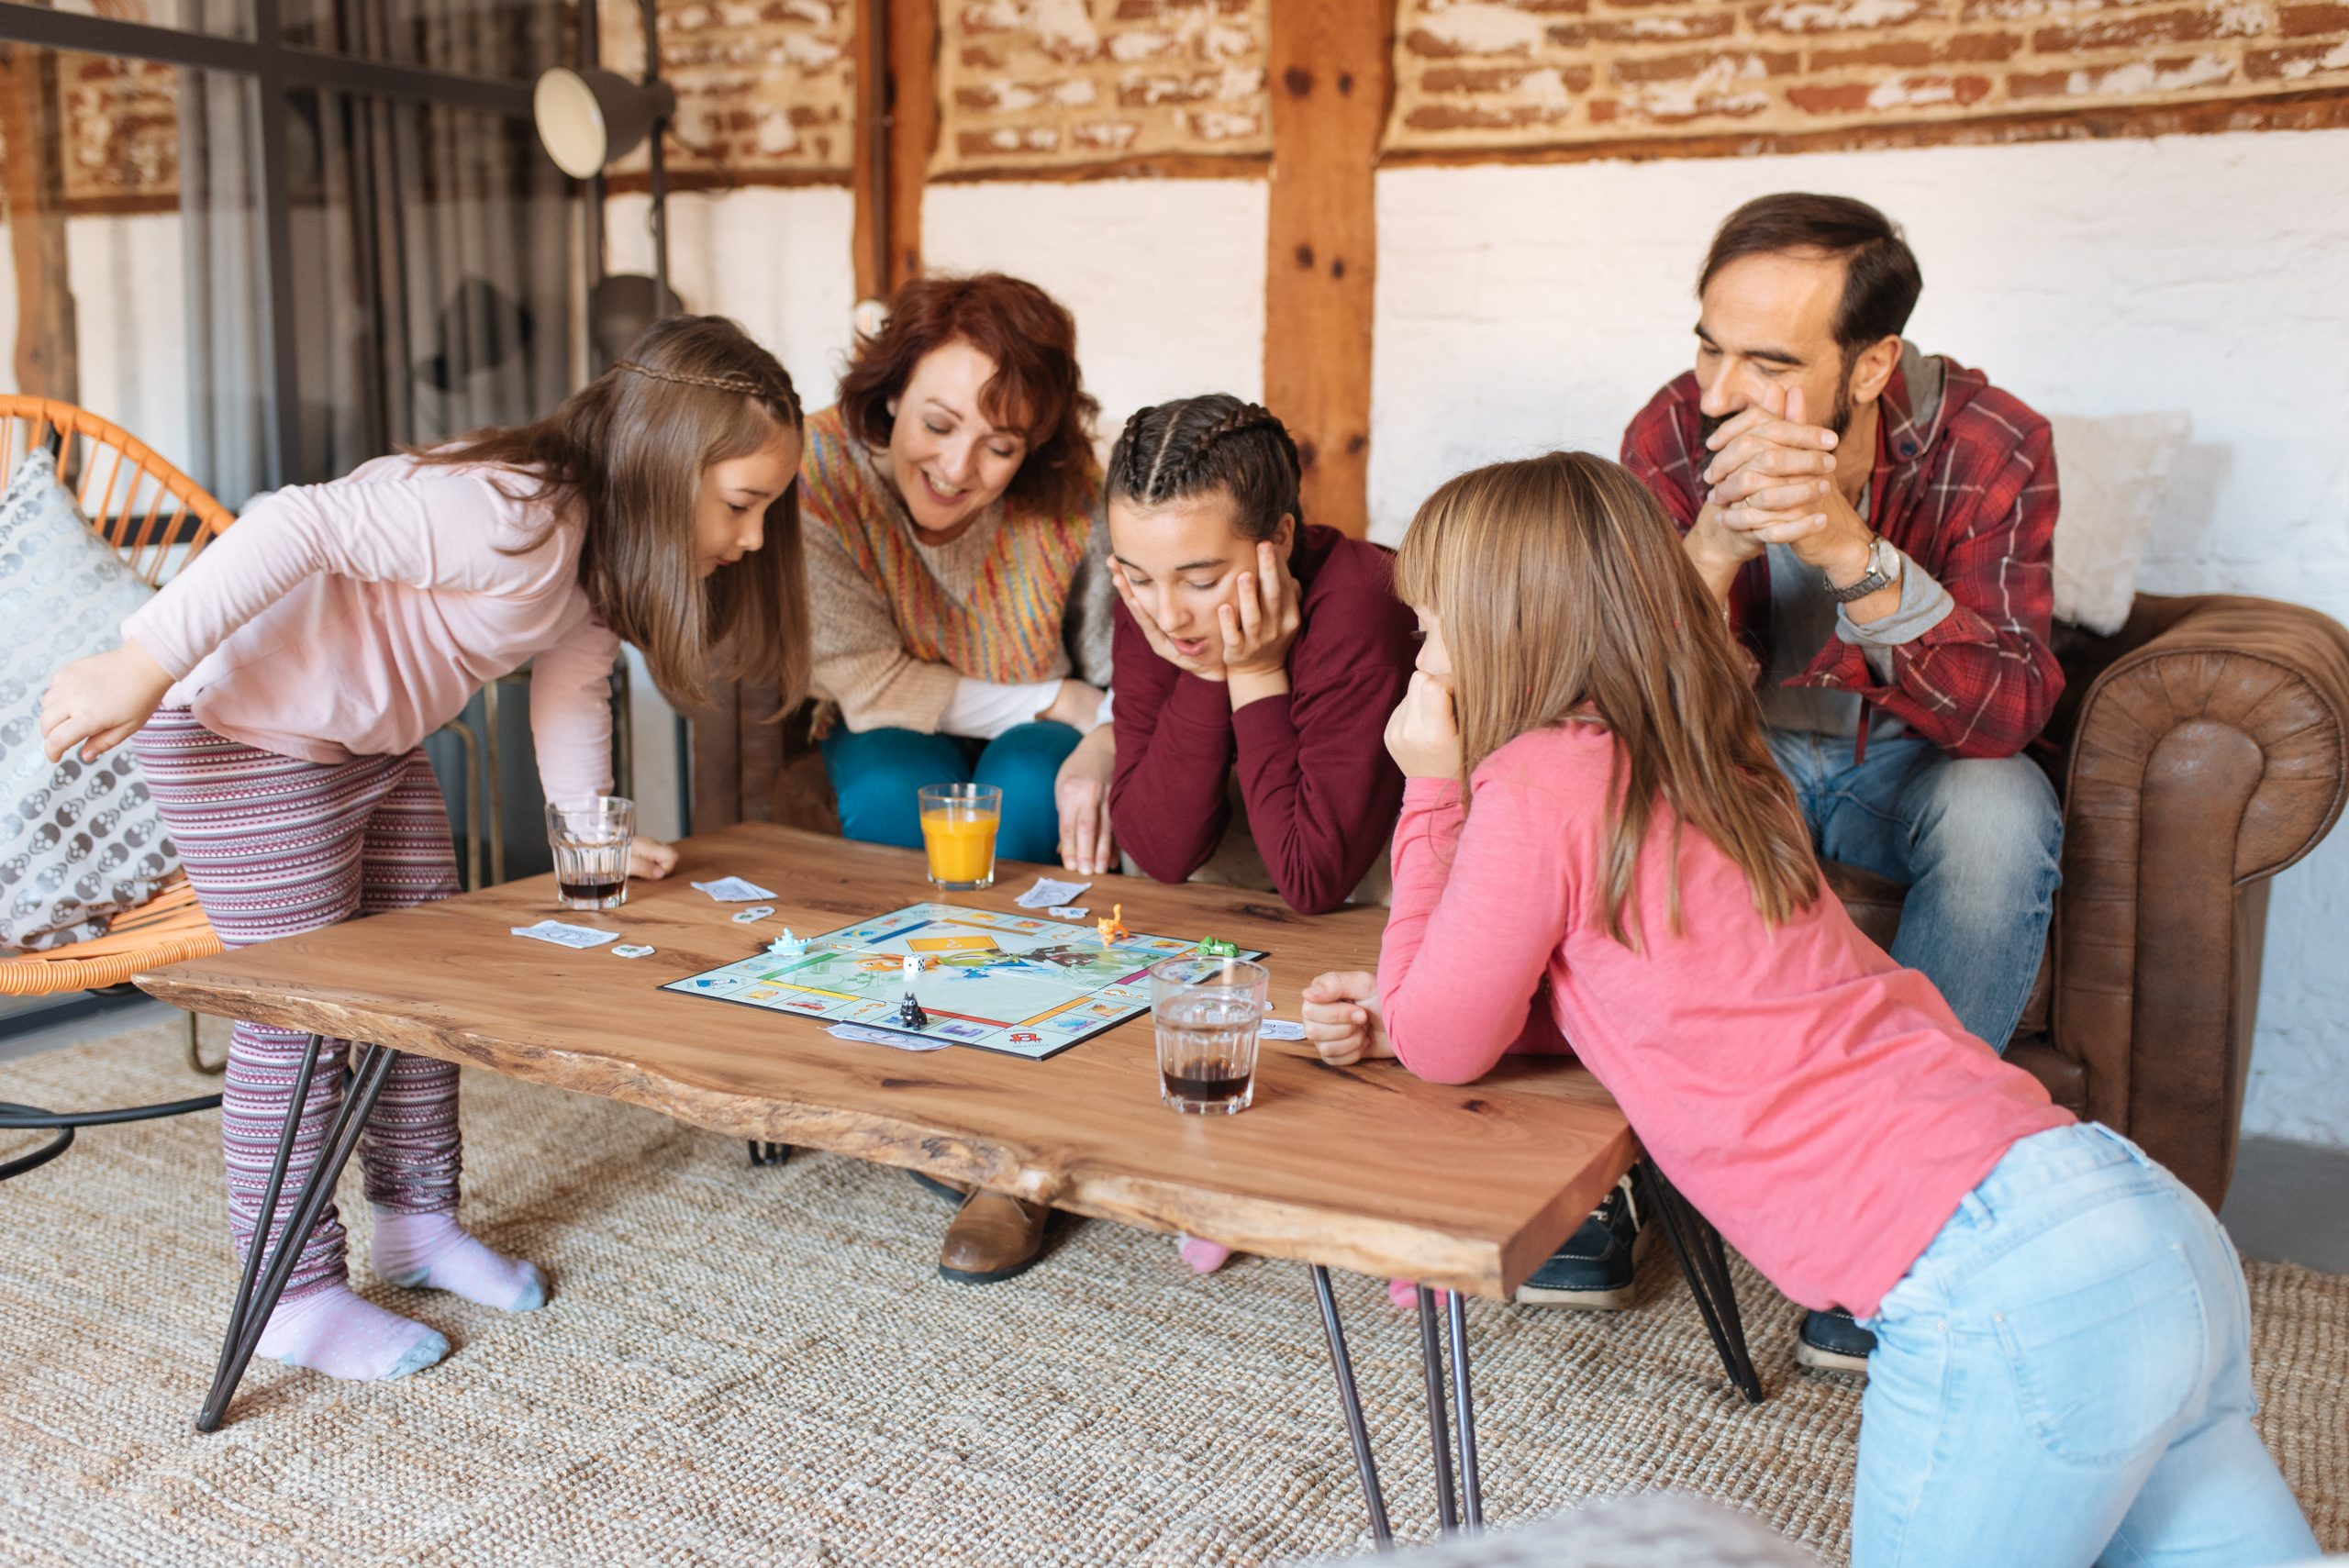 actividades en casa juegos de mesa